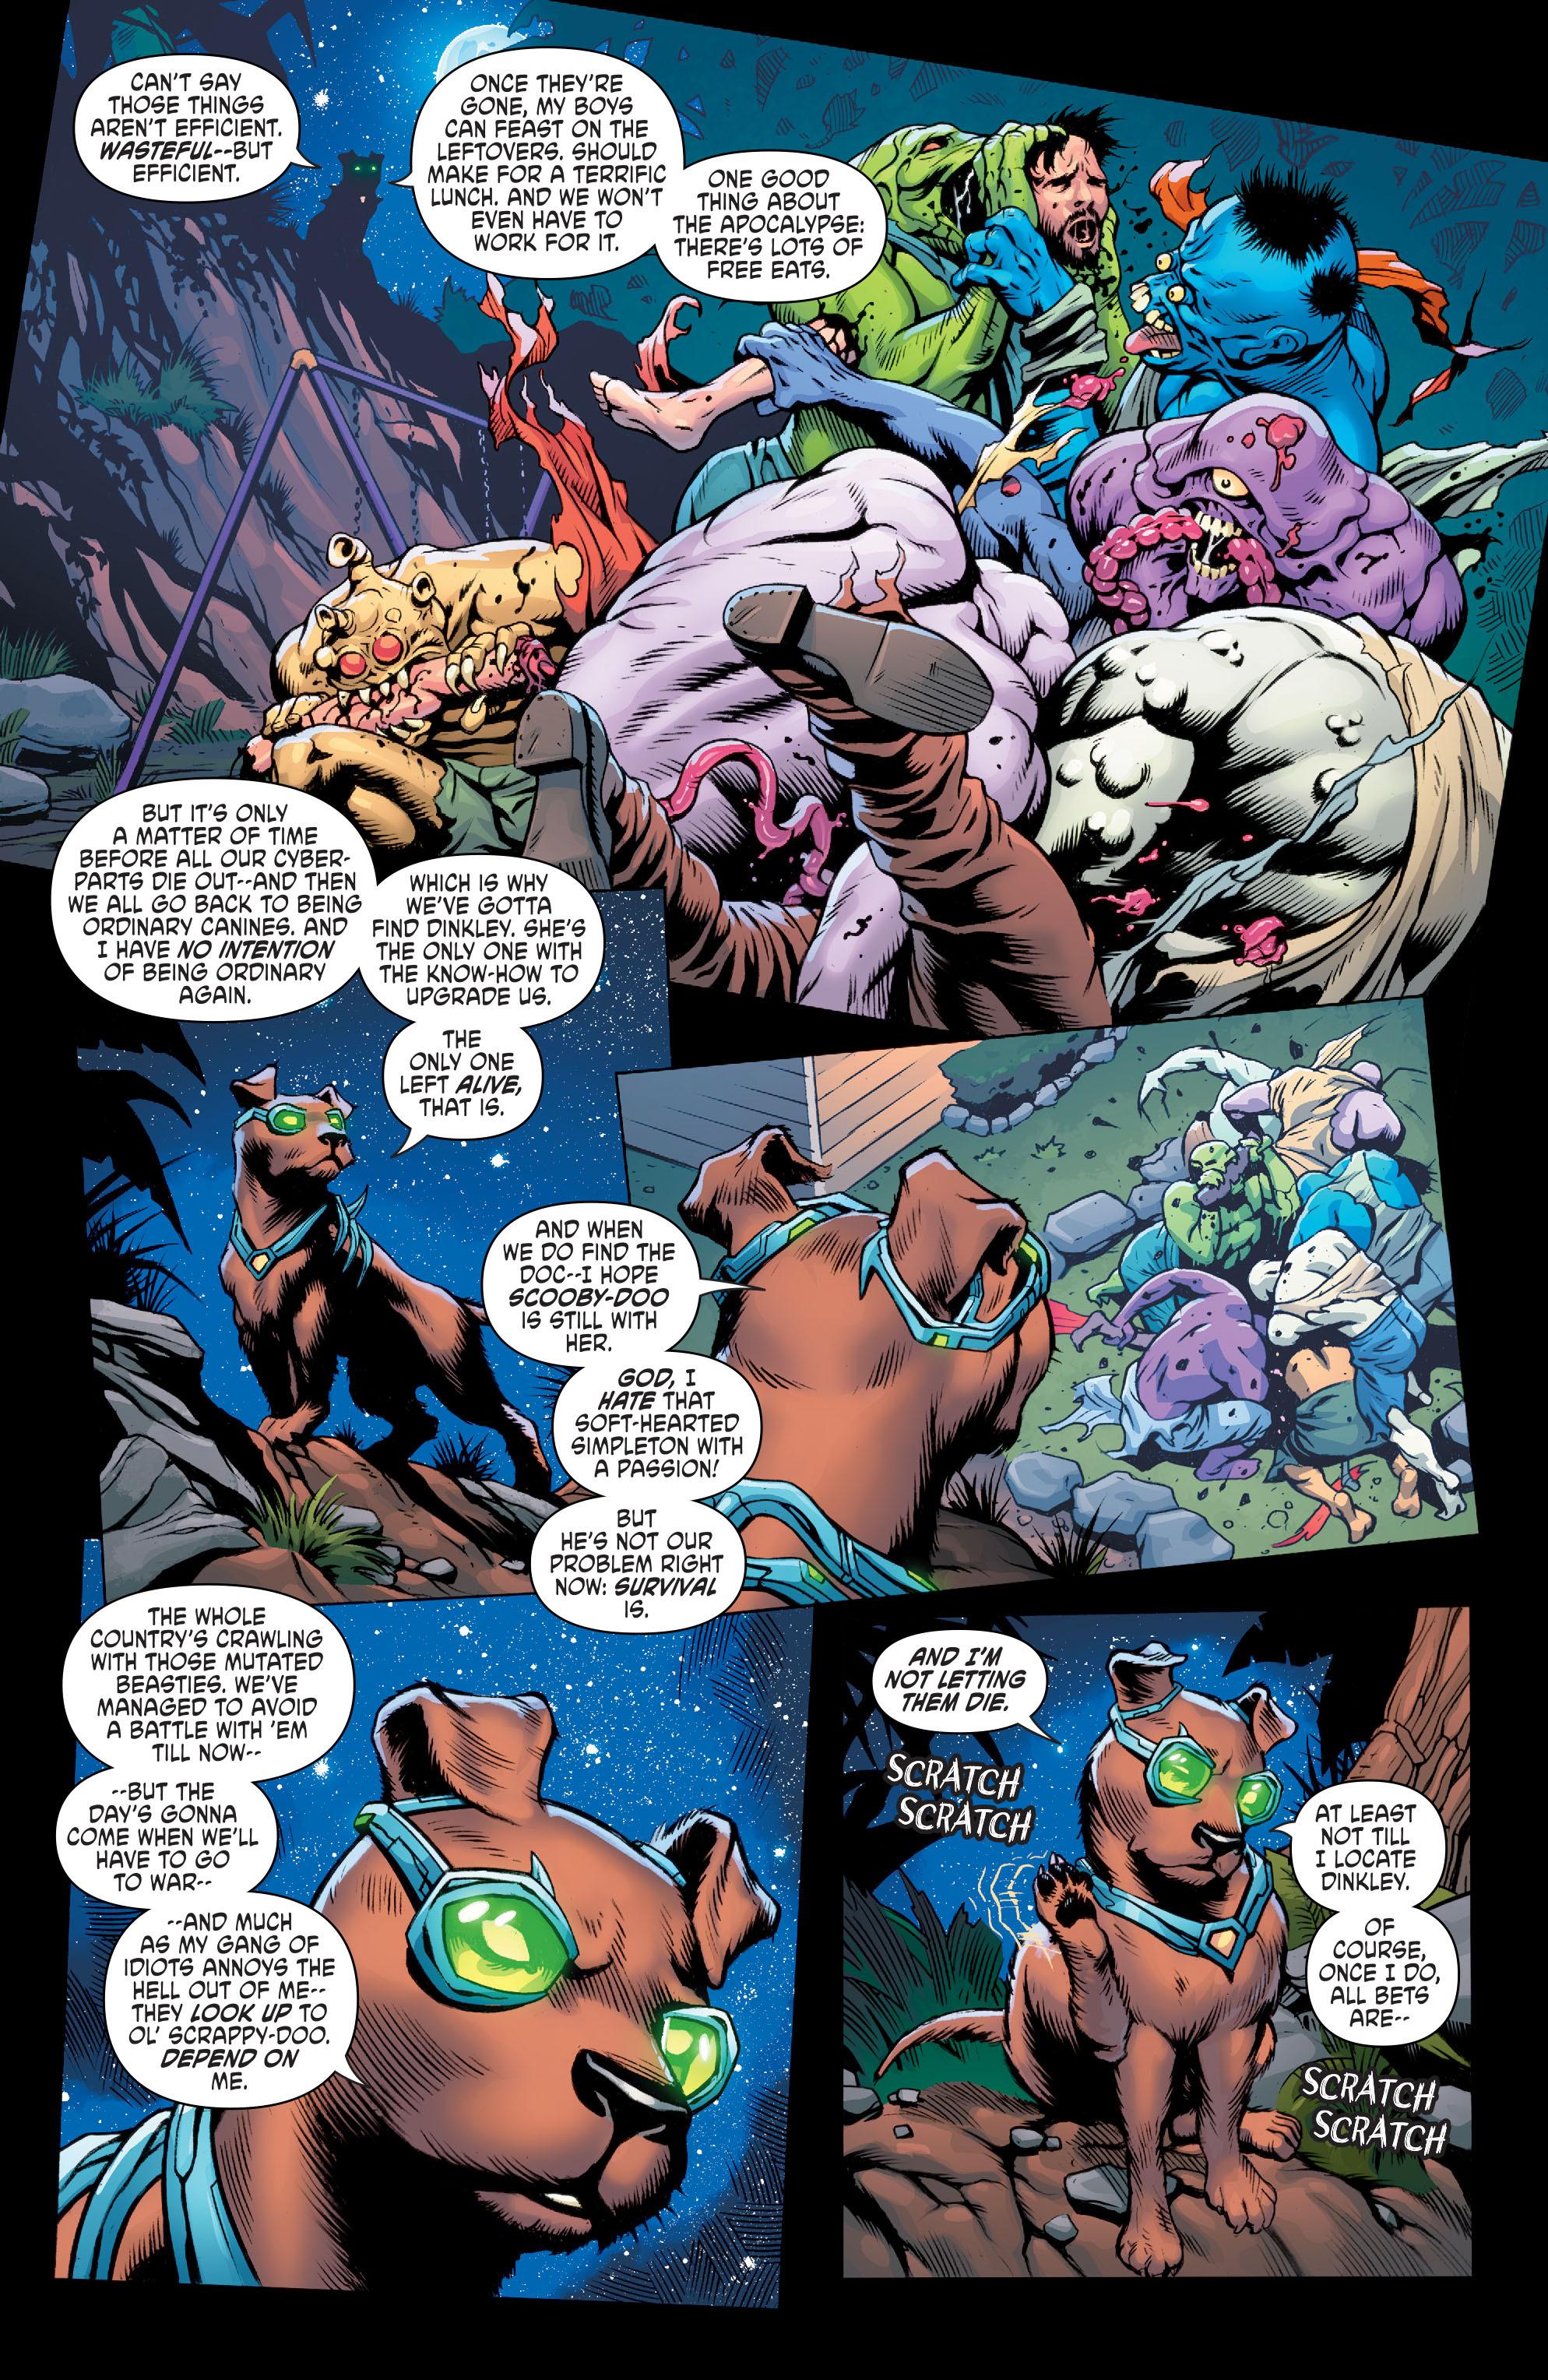 Read online Scooby Apocalypse comic -  Issue #6 - 23